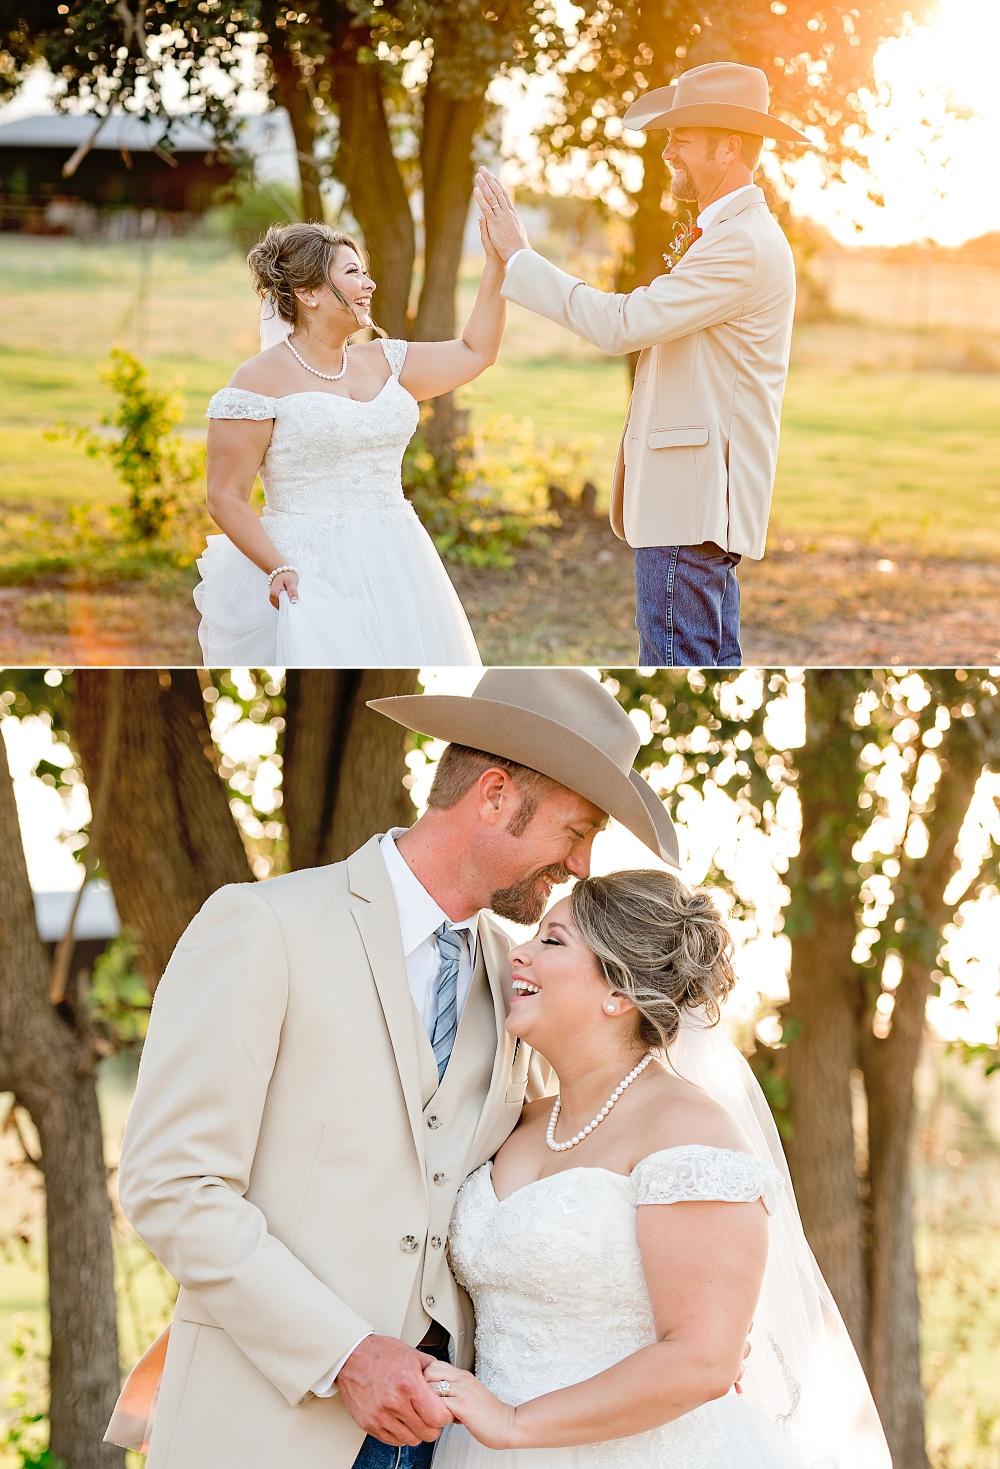 Wedding-Photographer-Rustic-Sunflower-theme-Texas-Carly-Barton-Photography_0105.jpg